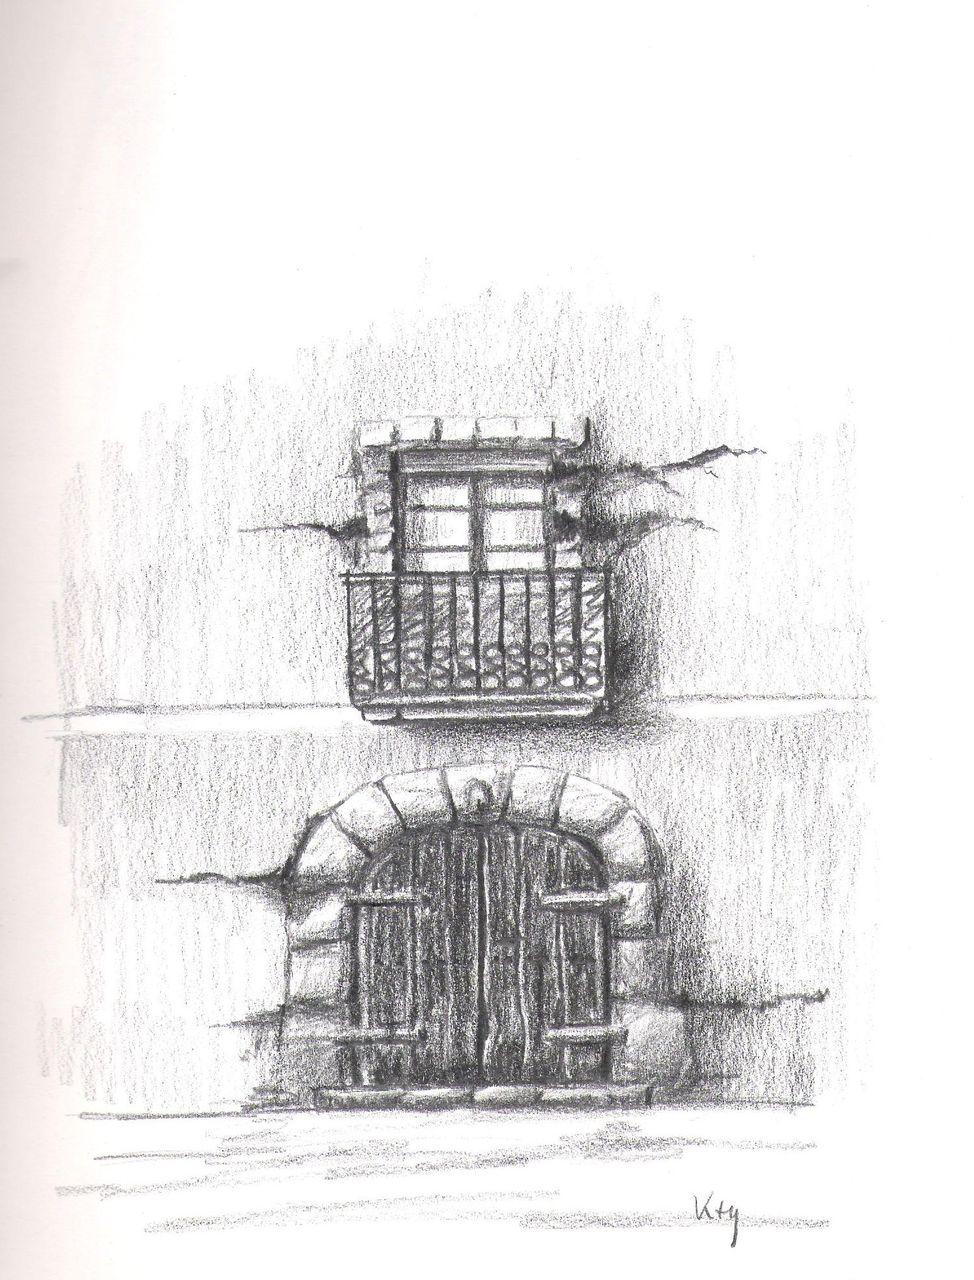 Catherine GRENOUILLAT Porte et fenêtre